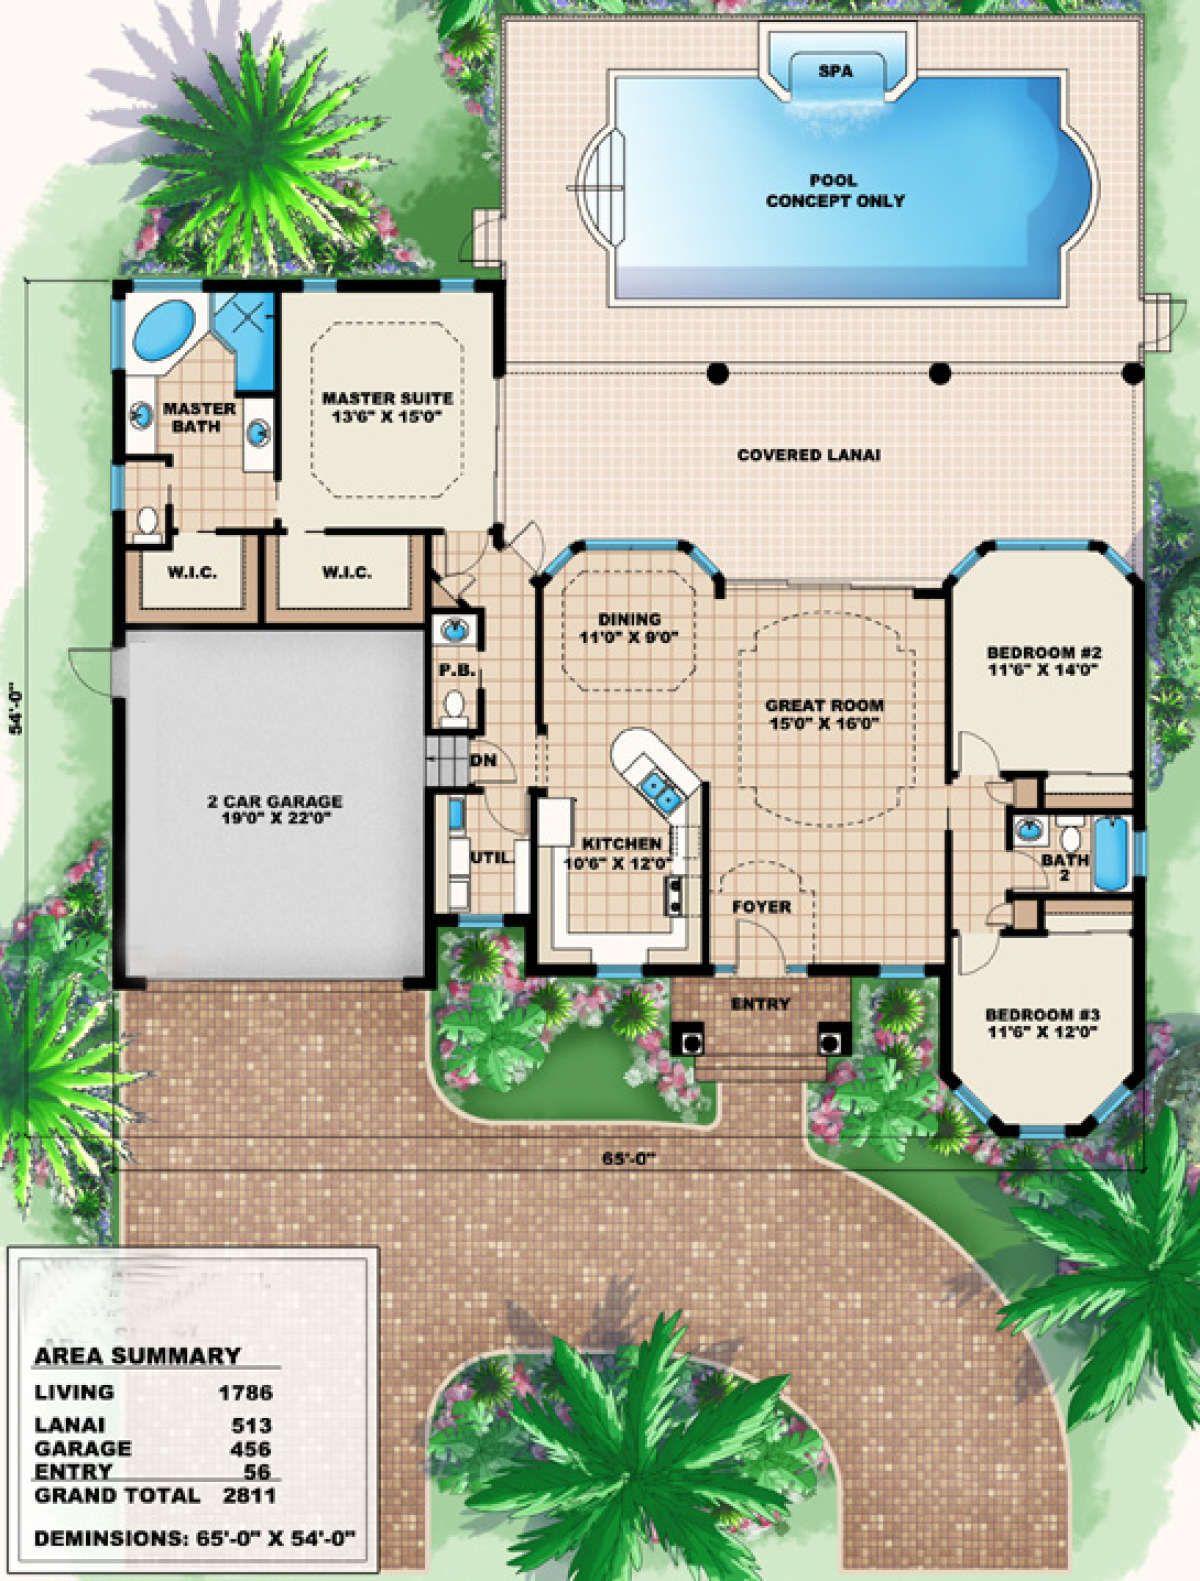 House Plan 1018 00006 Mediterranean Plan 1 786 Square Feet 3 Bedrooms 2 5 Bathrooms Sims 4 House Building Mediterranean Style House Plans Mediterranean House Plans